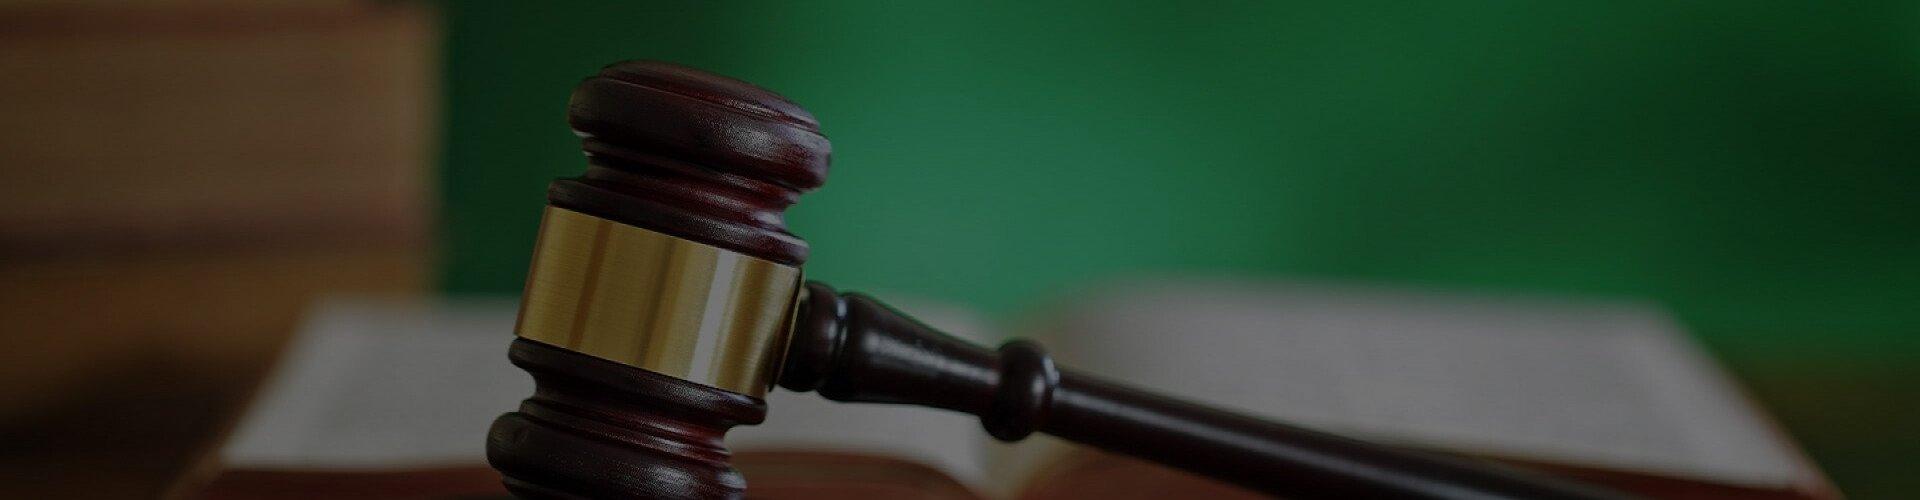 Юридические услуги в компании Маршалл